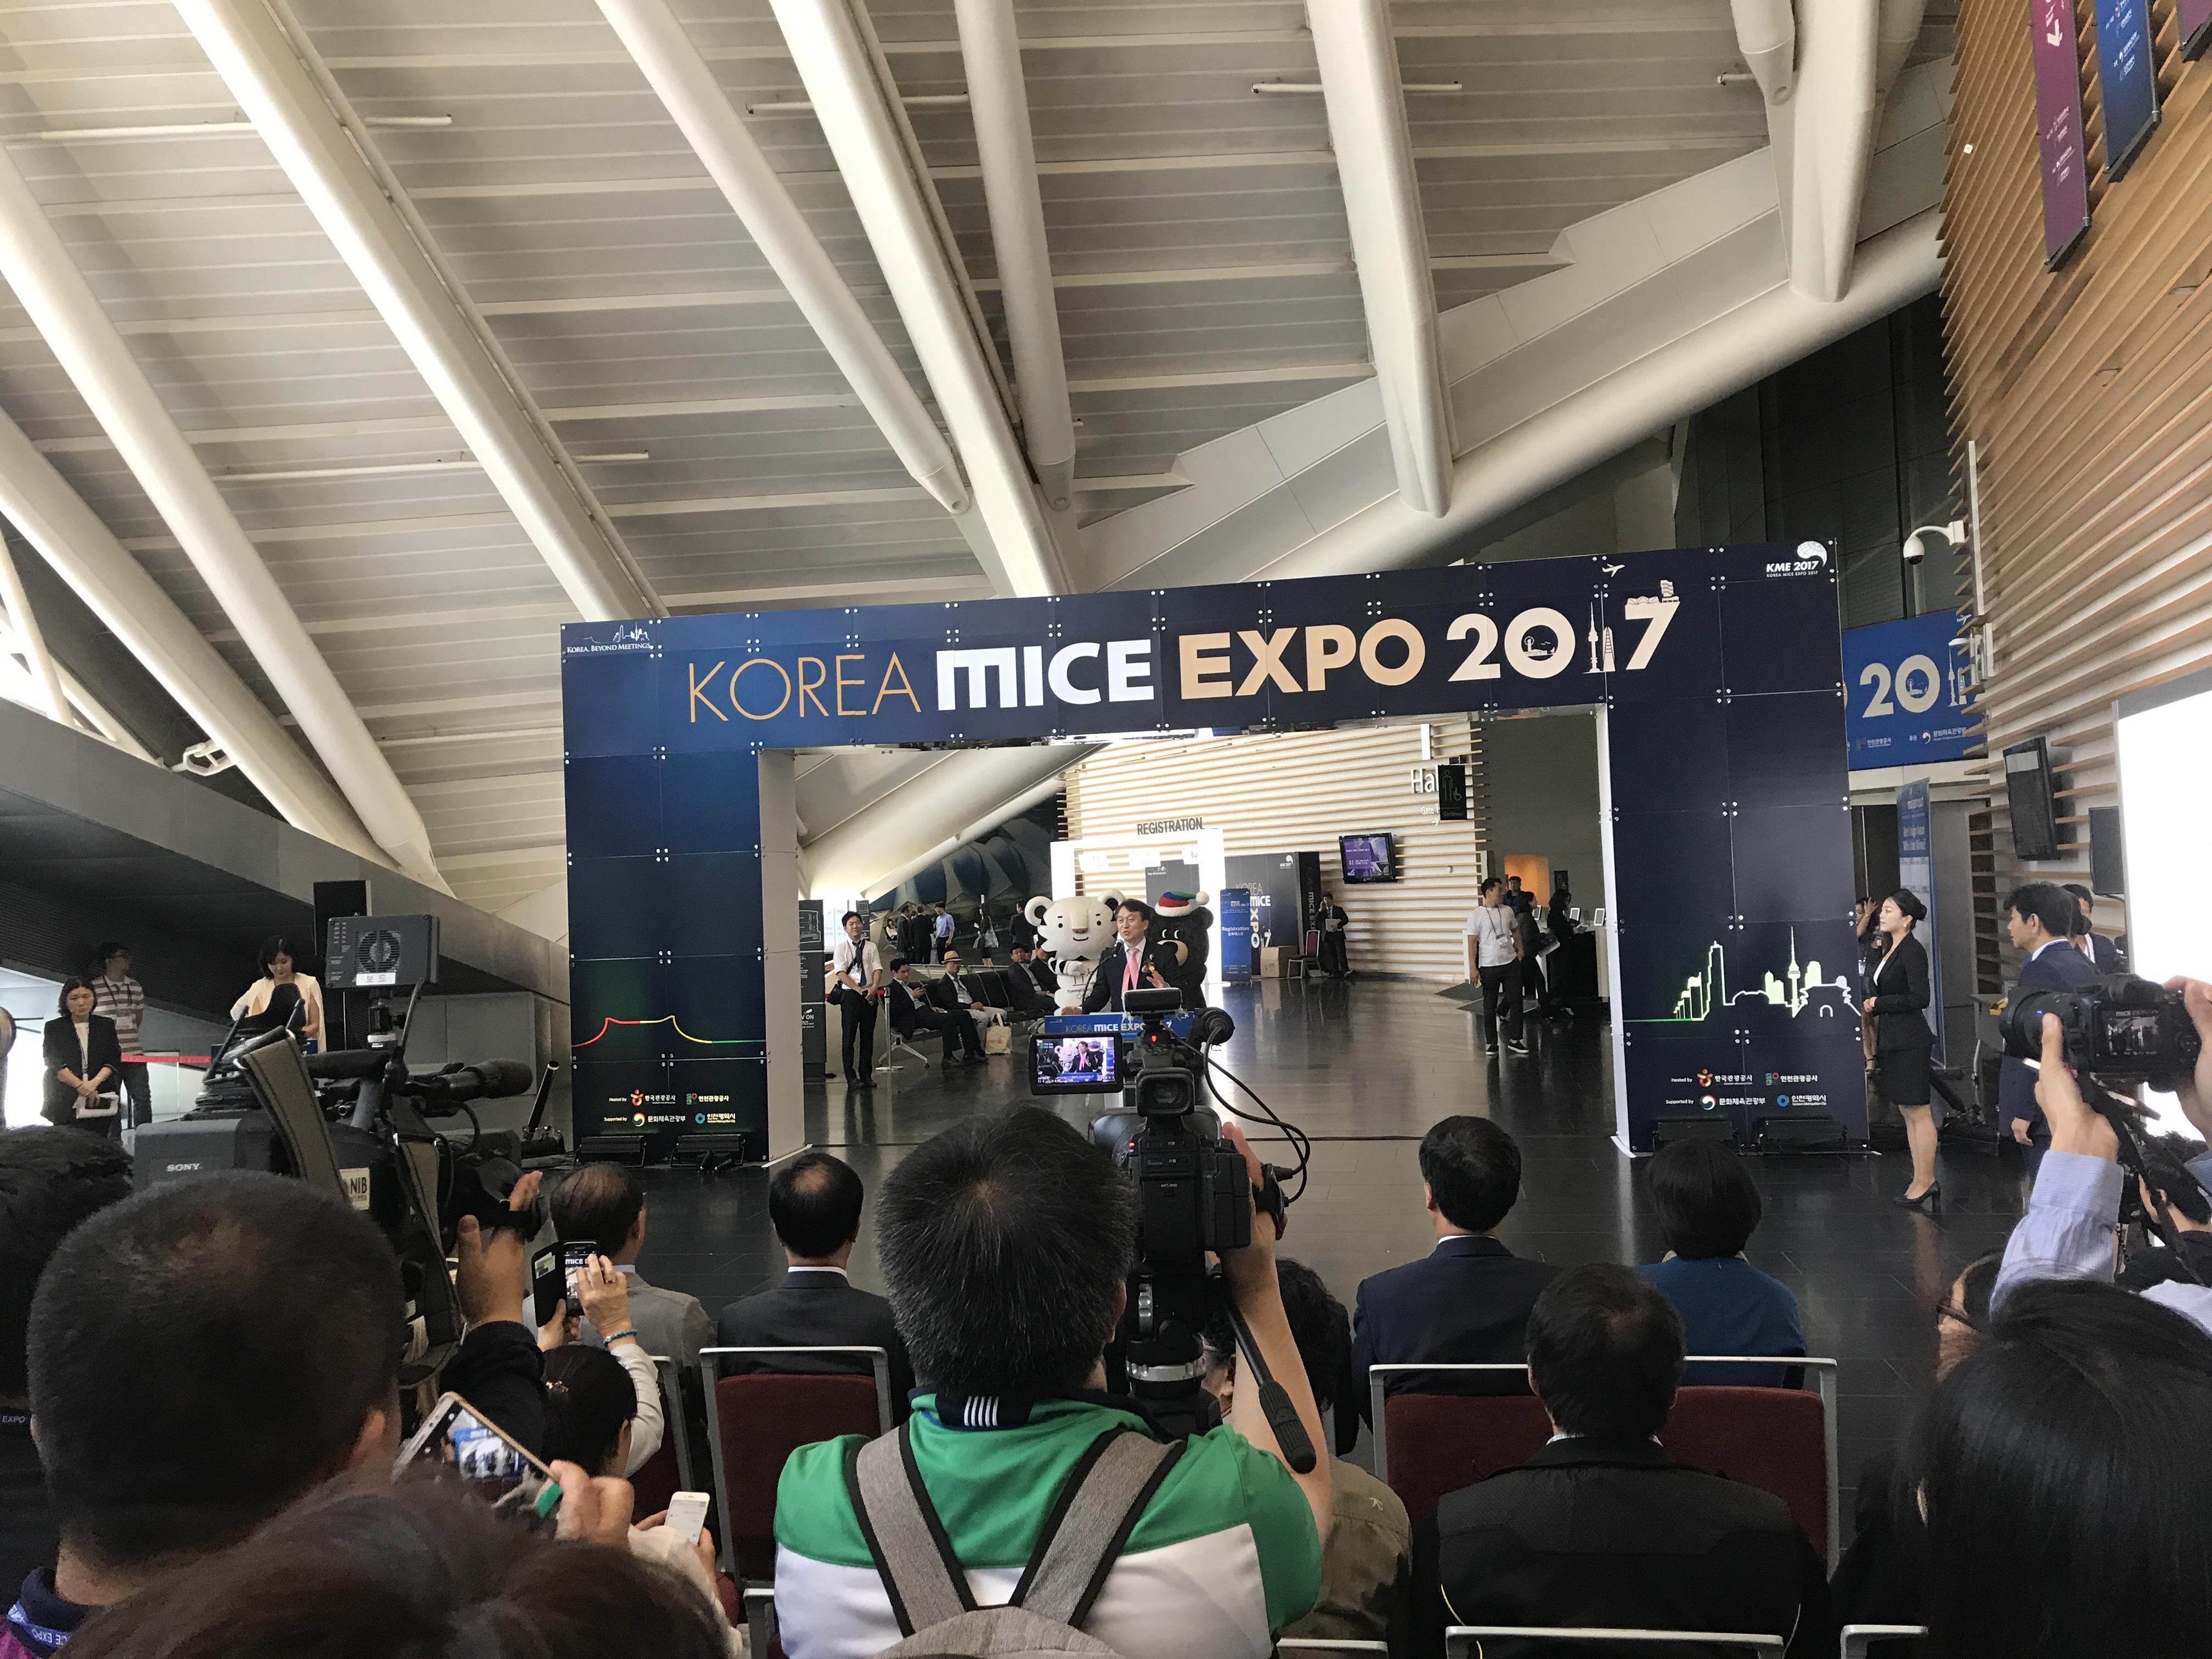 Korea MICE EXPO 2017 행사장, 기자들과 관계자들이 모여 있다